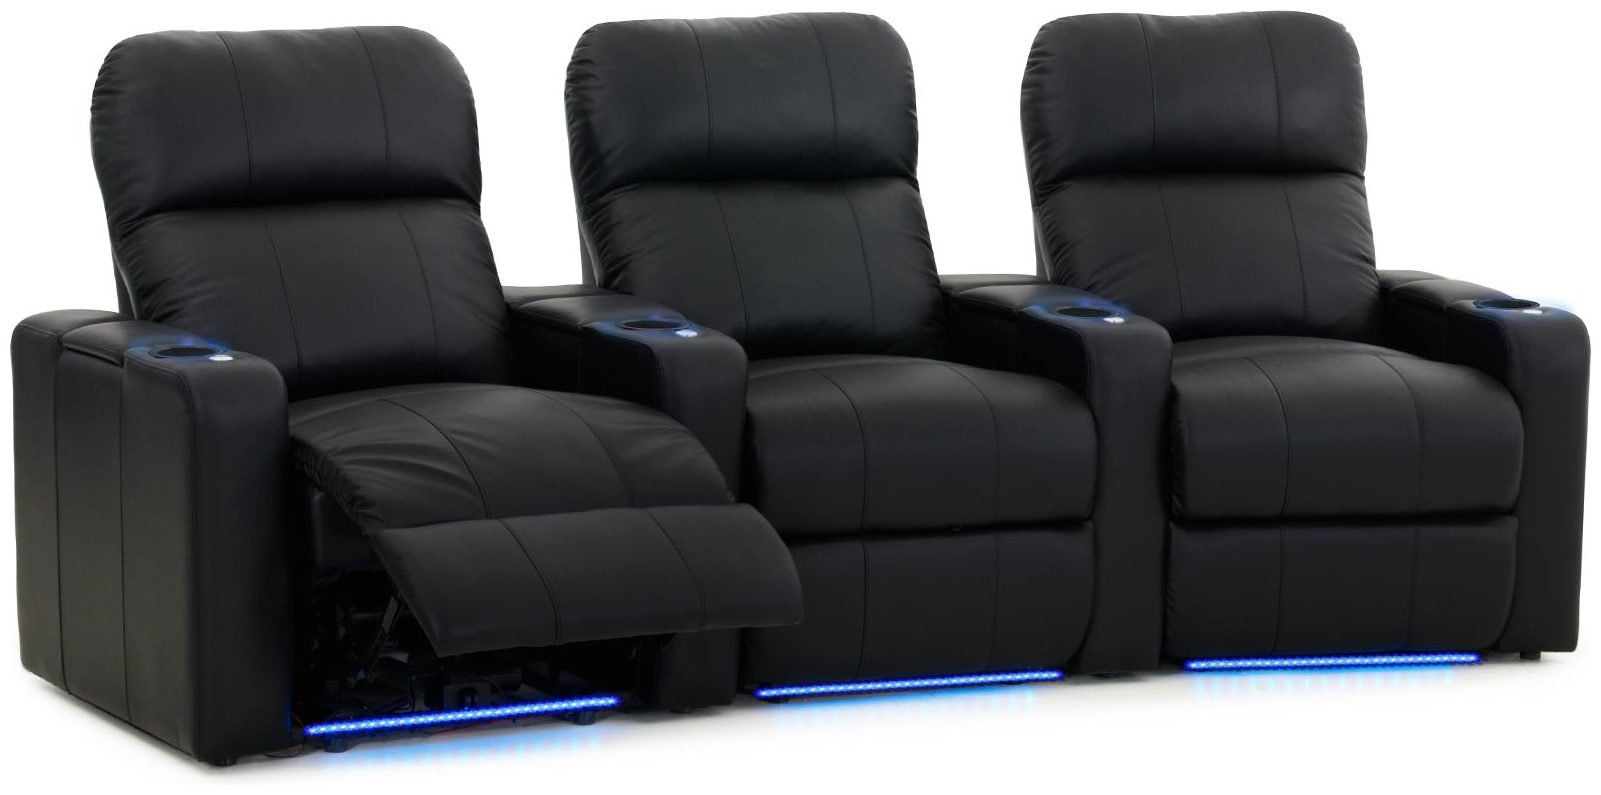 Bio Octane Seating XL700 Turbo Svart 3-sits Rak